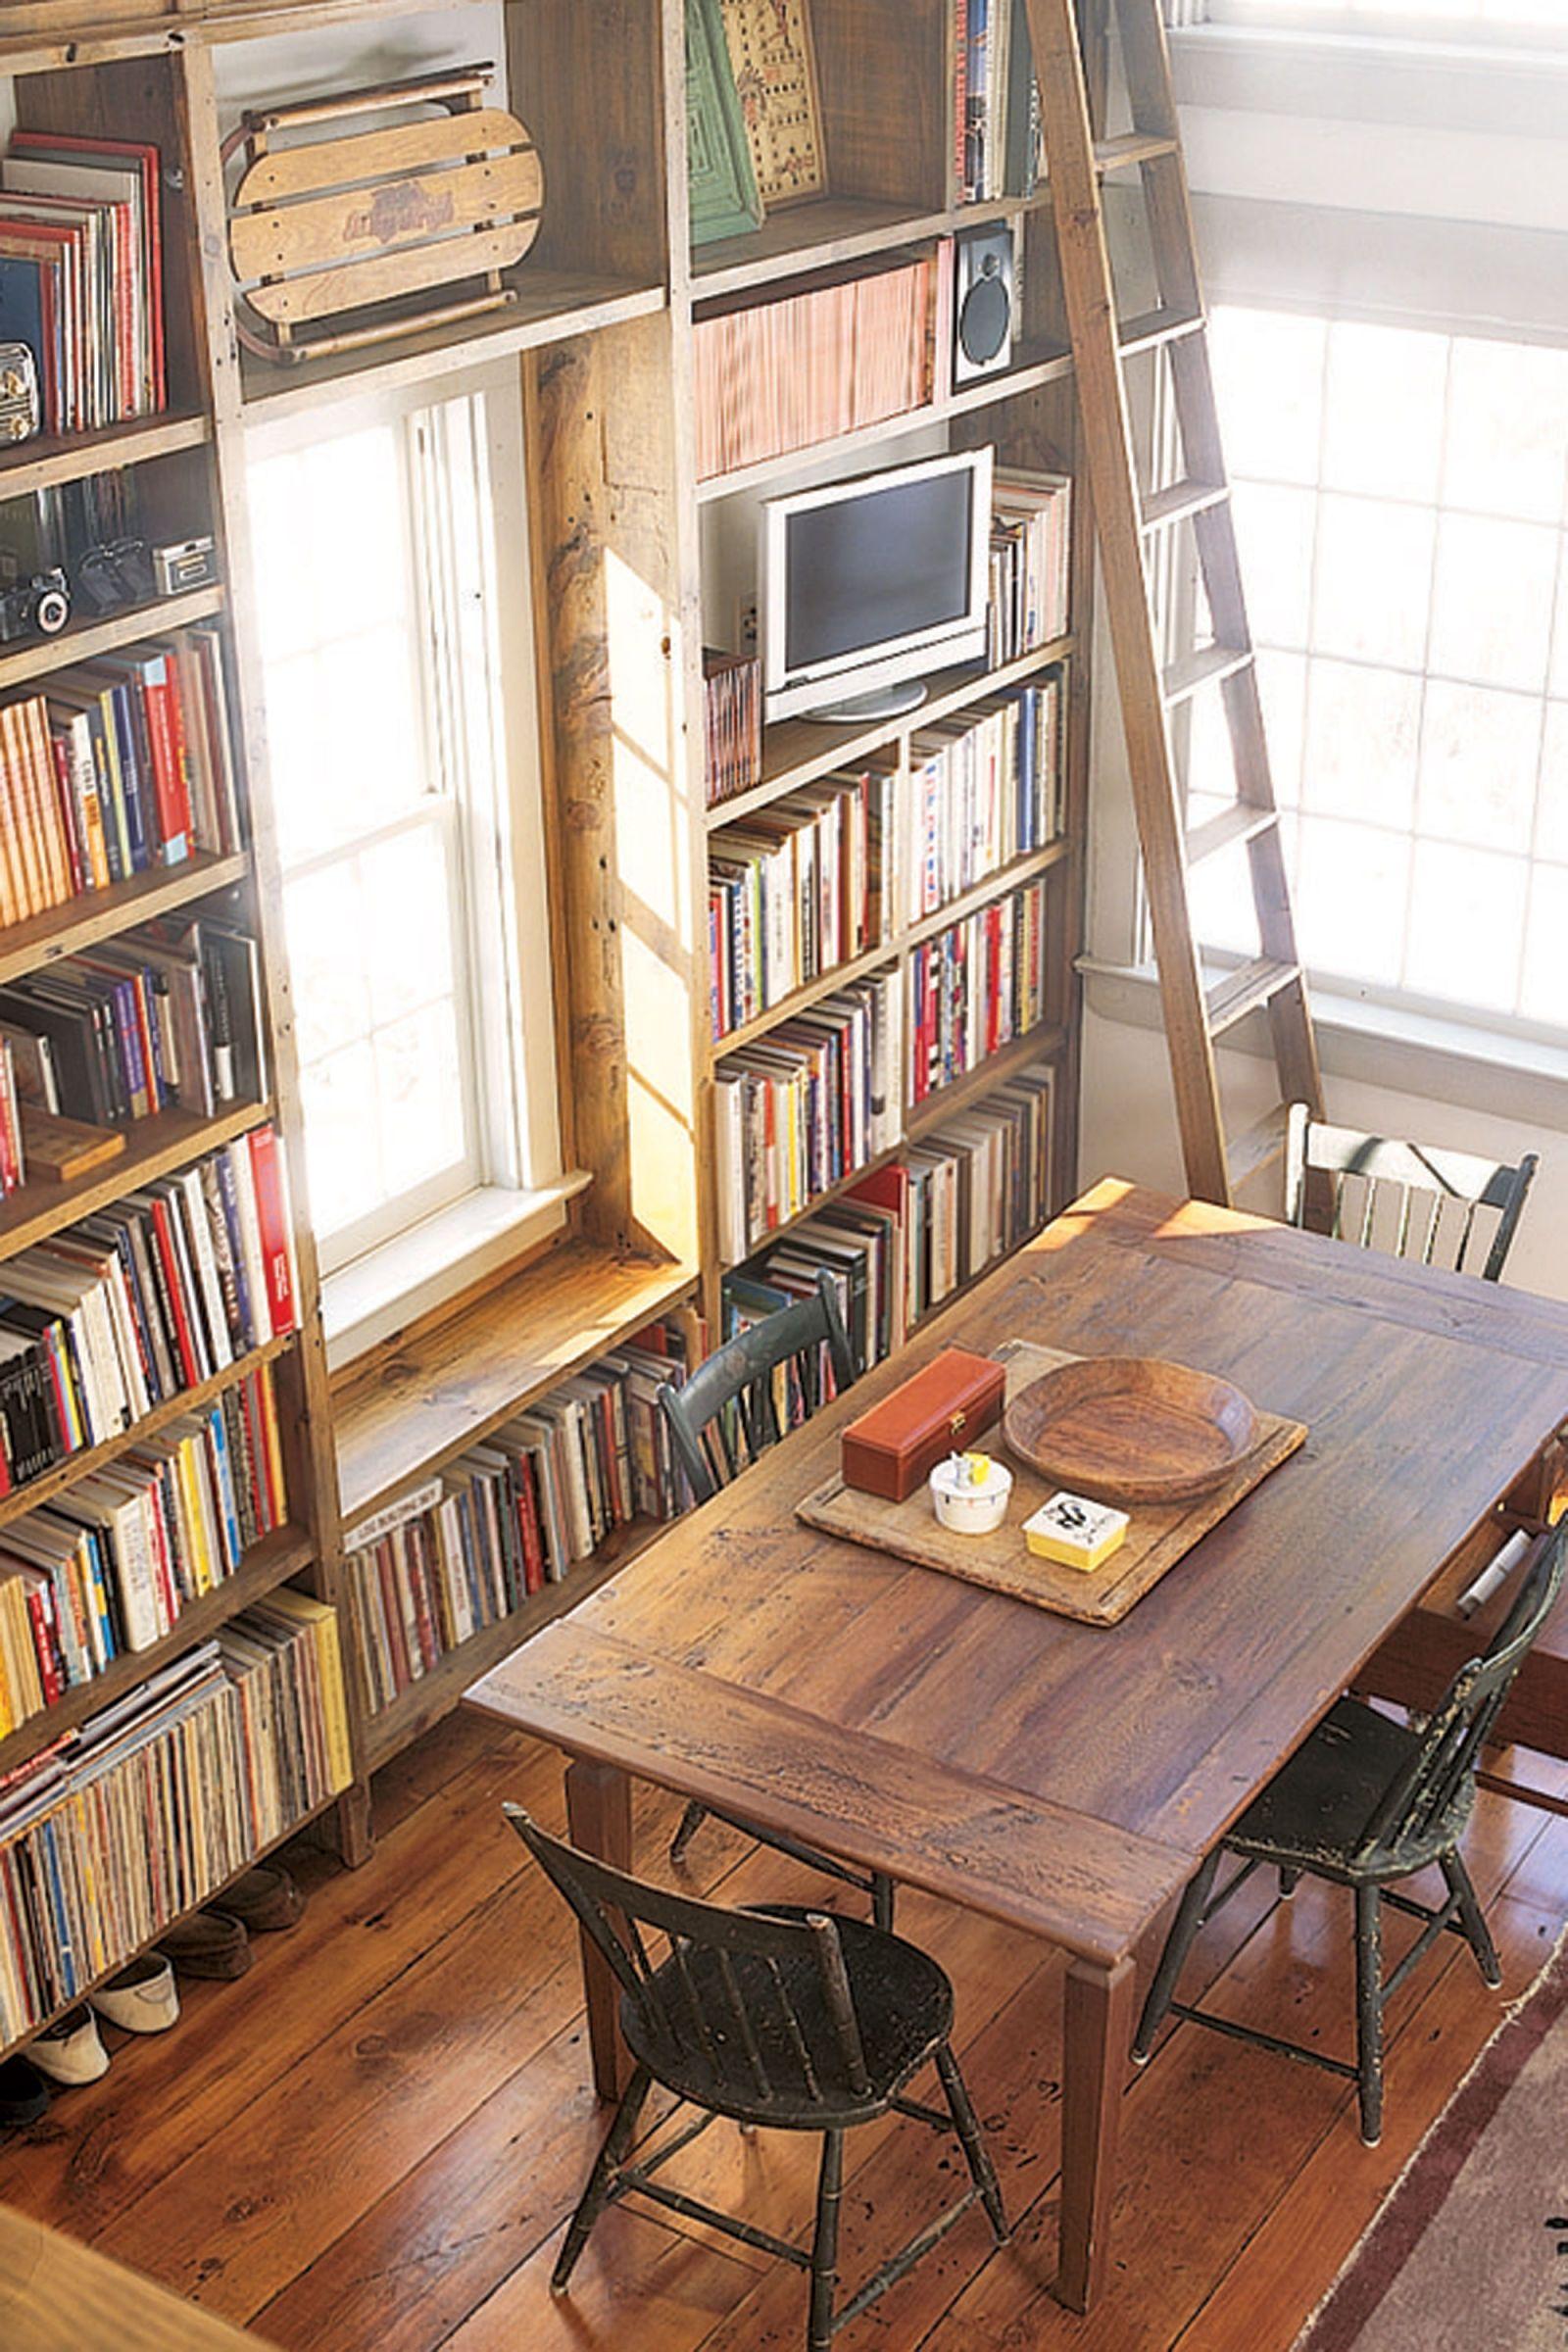 Barn Library  - CountryLiving.com